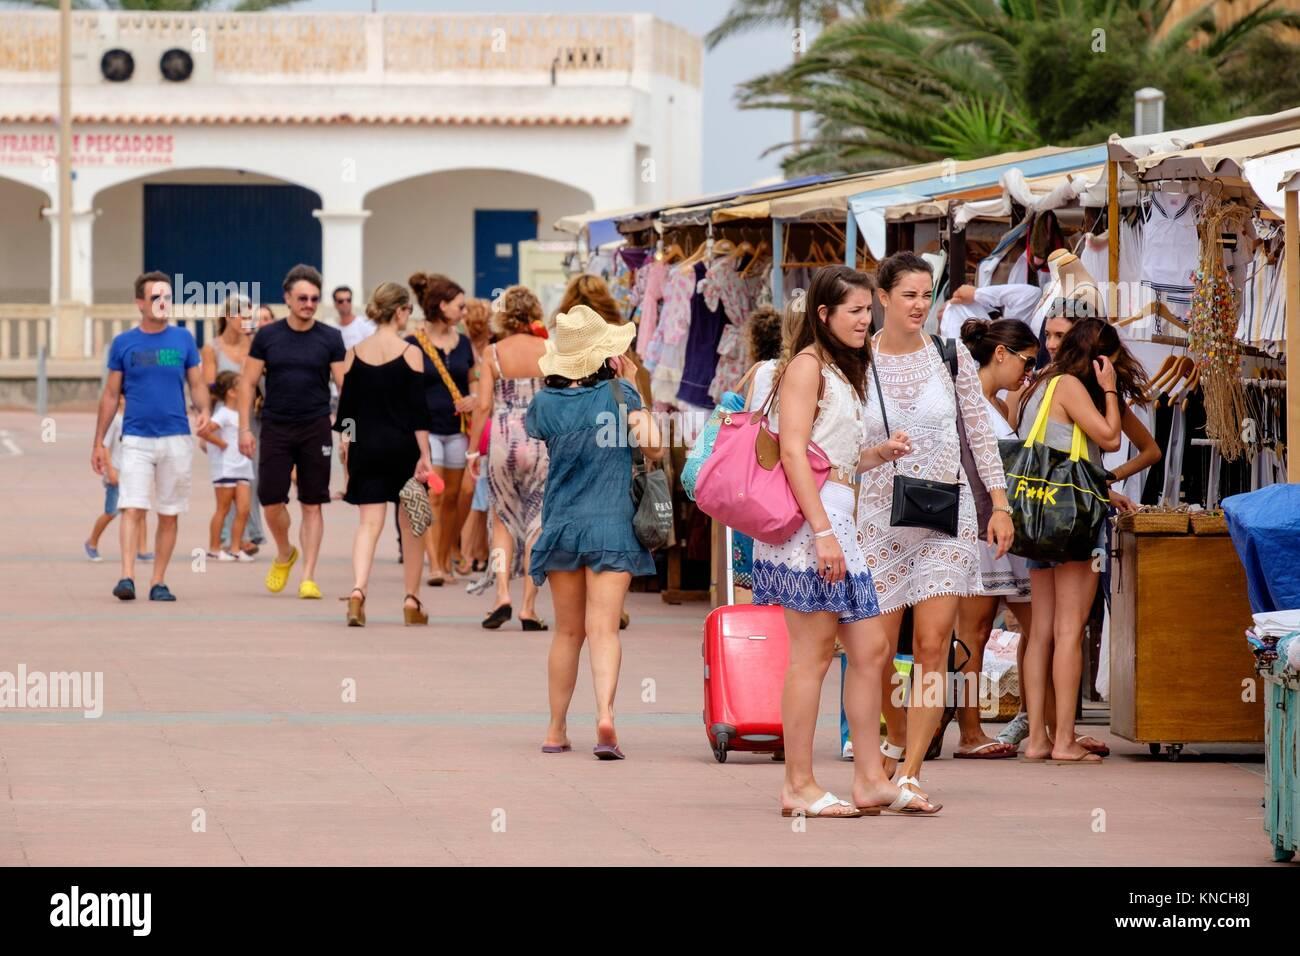 Flea market, Sa Savina, Formentera, Balearic Islands, Spain. - Stock Image